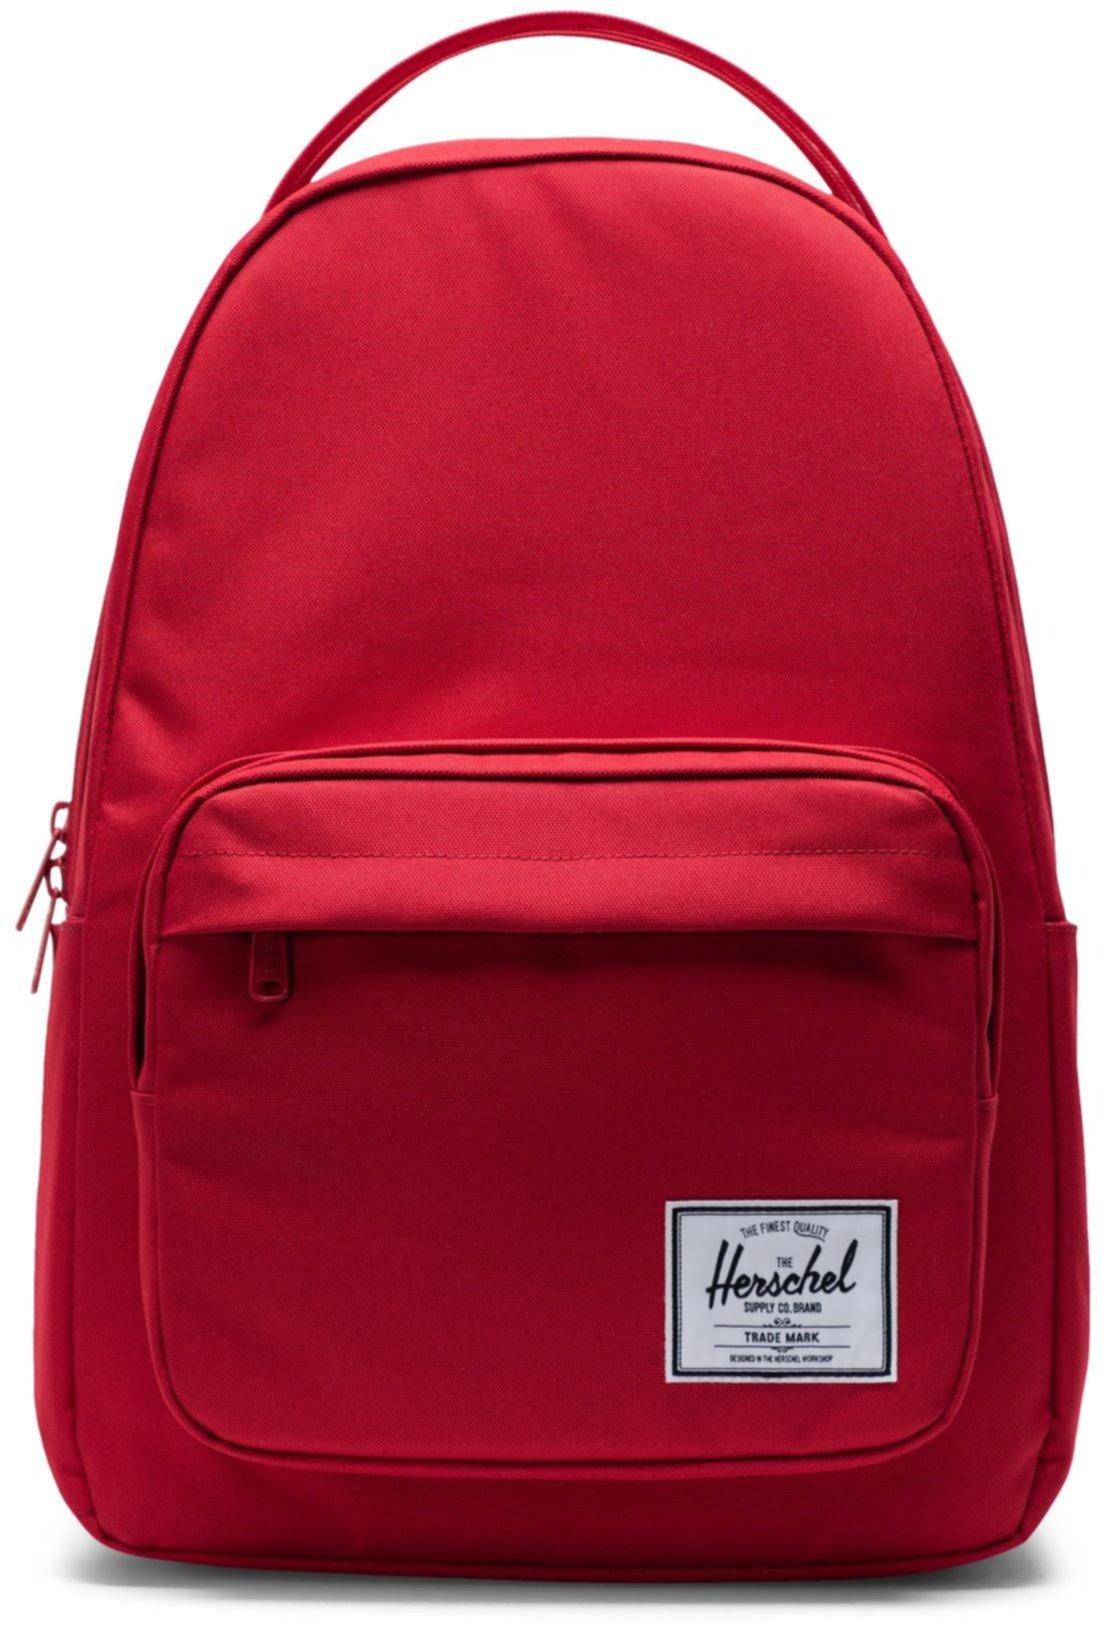 мельник Herschel Supply Co.